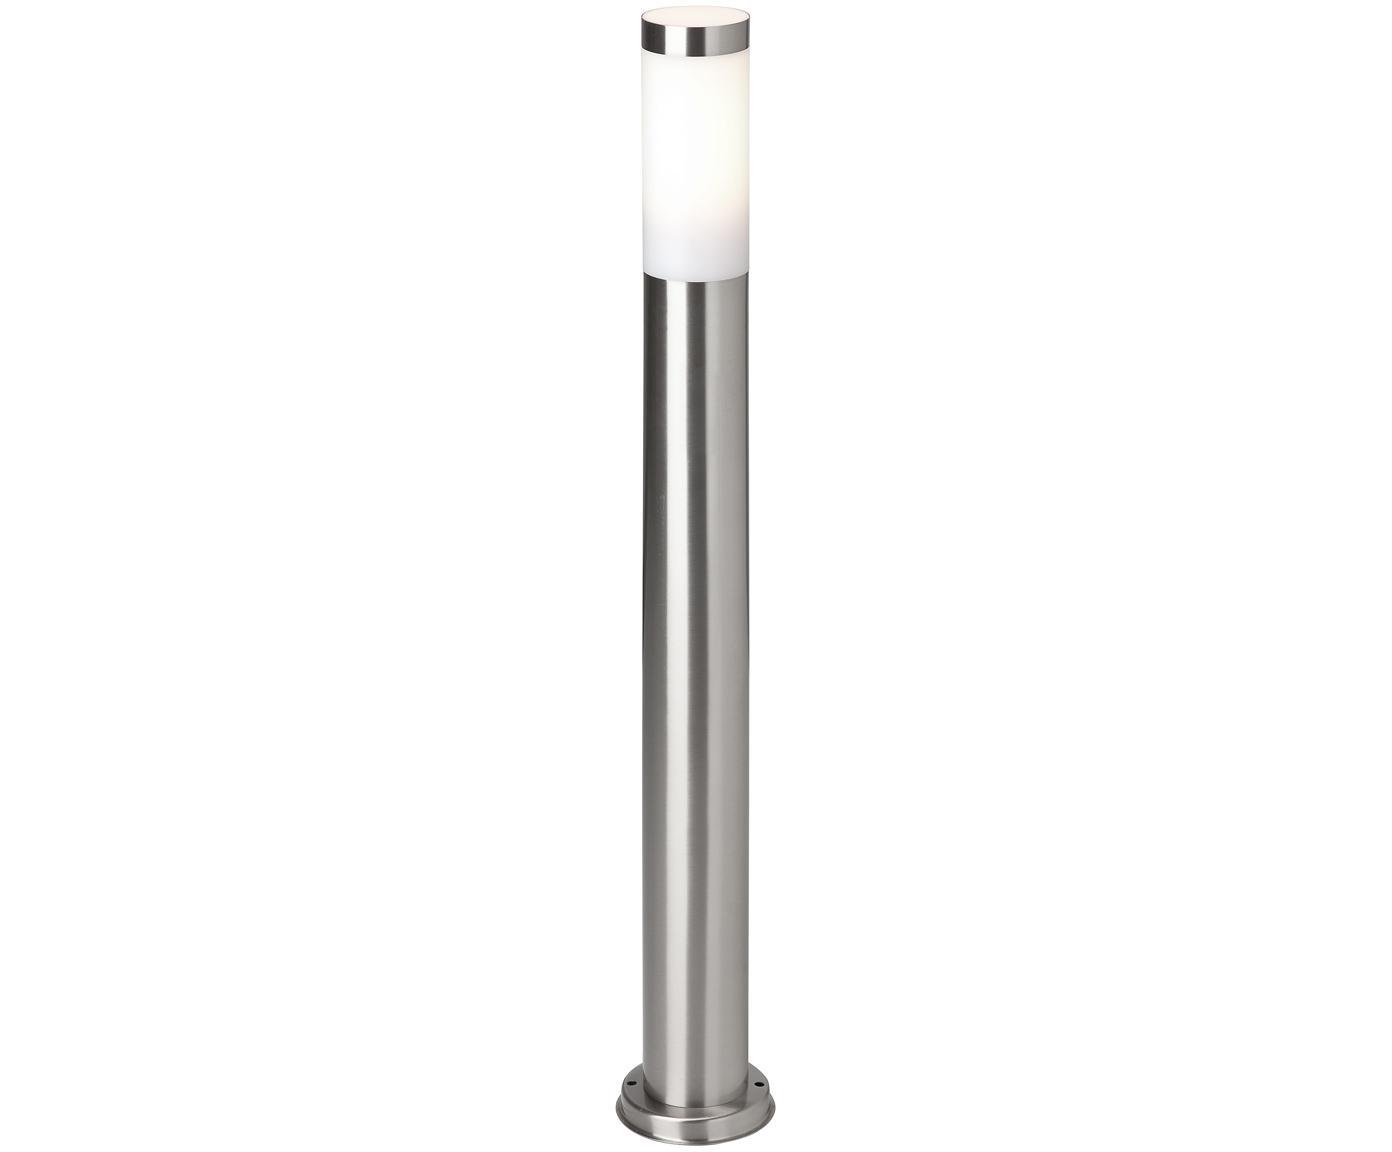 Lampada da terra da esterno Chorus, Base della lampada: acciaio inossidabile, Acciaio inossidabile, bianco, Ø 8 x Alt. 80 cm